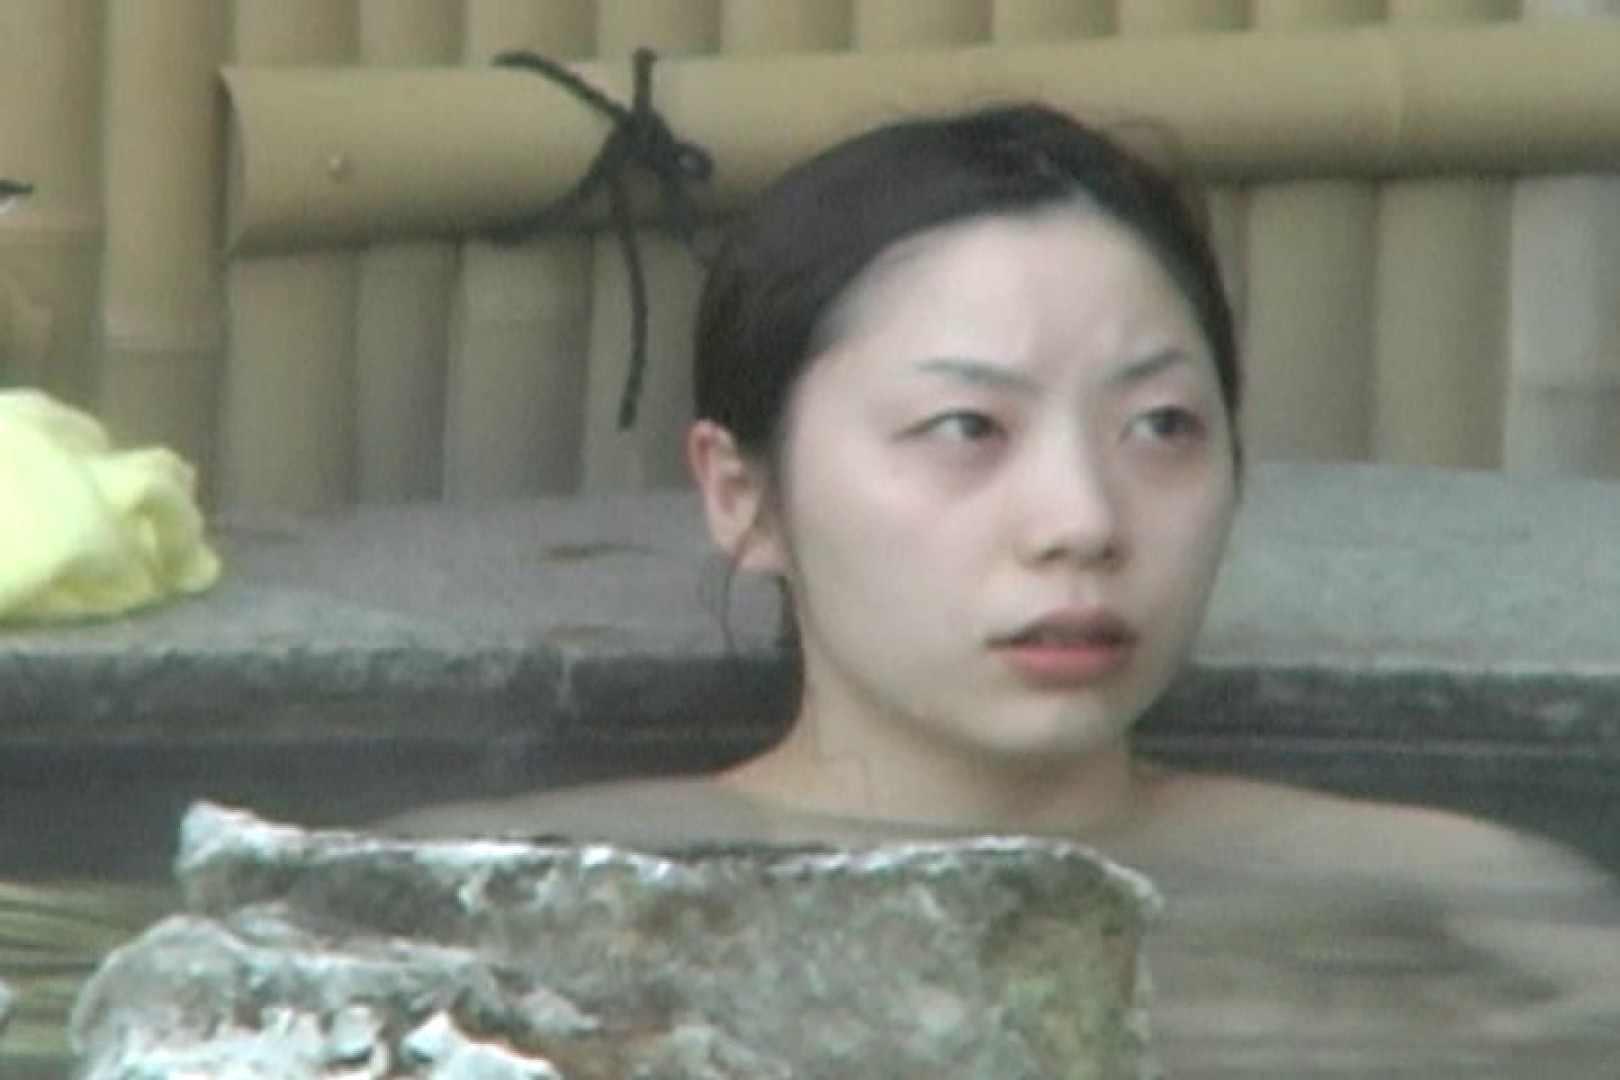 Aquaな露天風呂Vol.596 盗撮シリーズ | 露天風呂編  113PIX 3